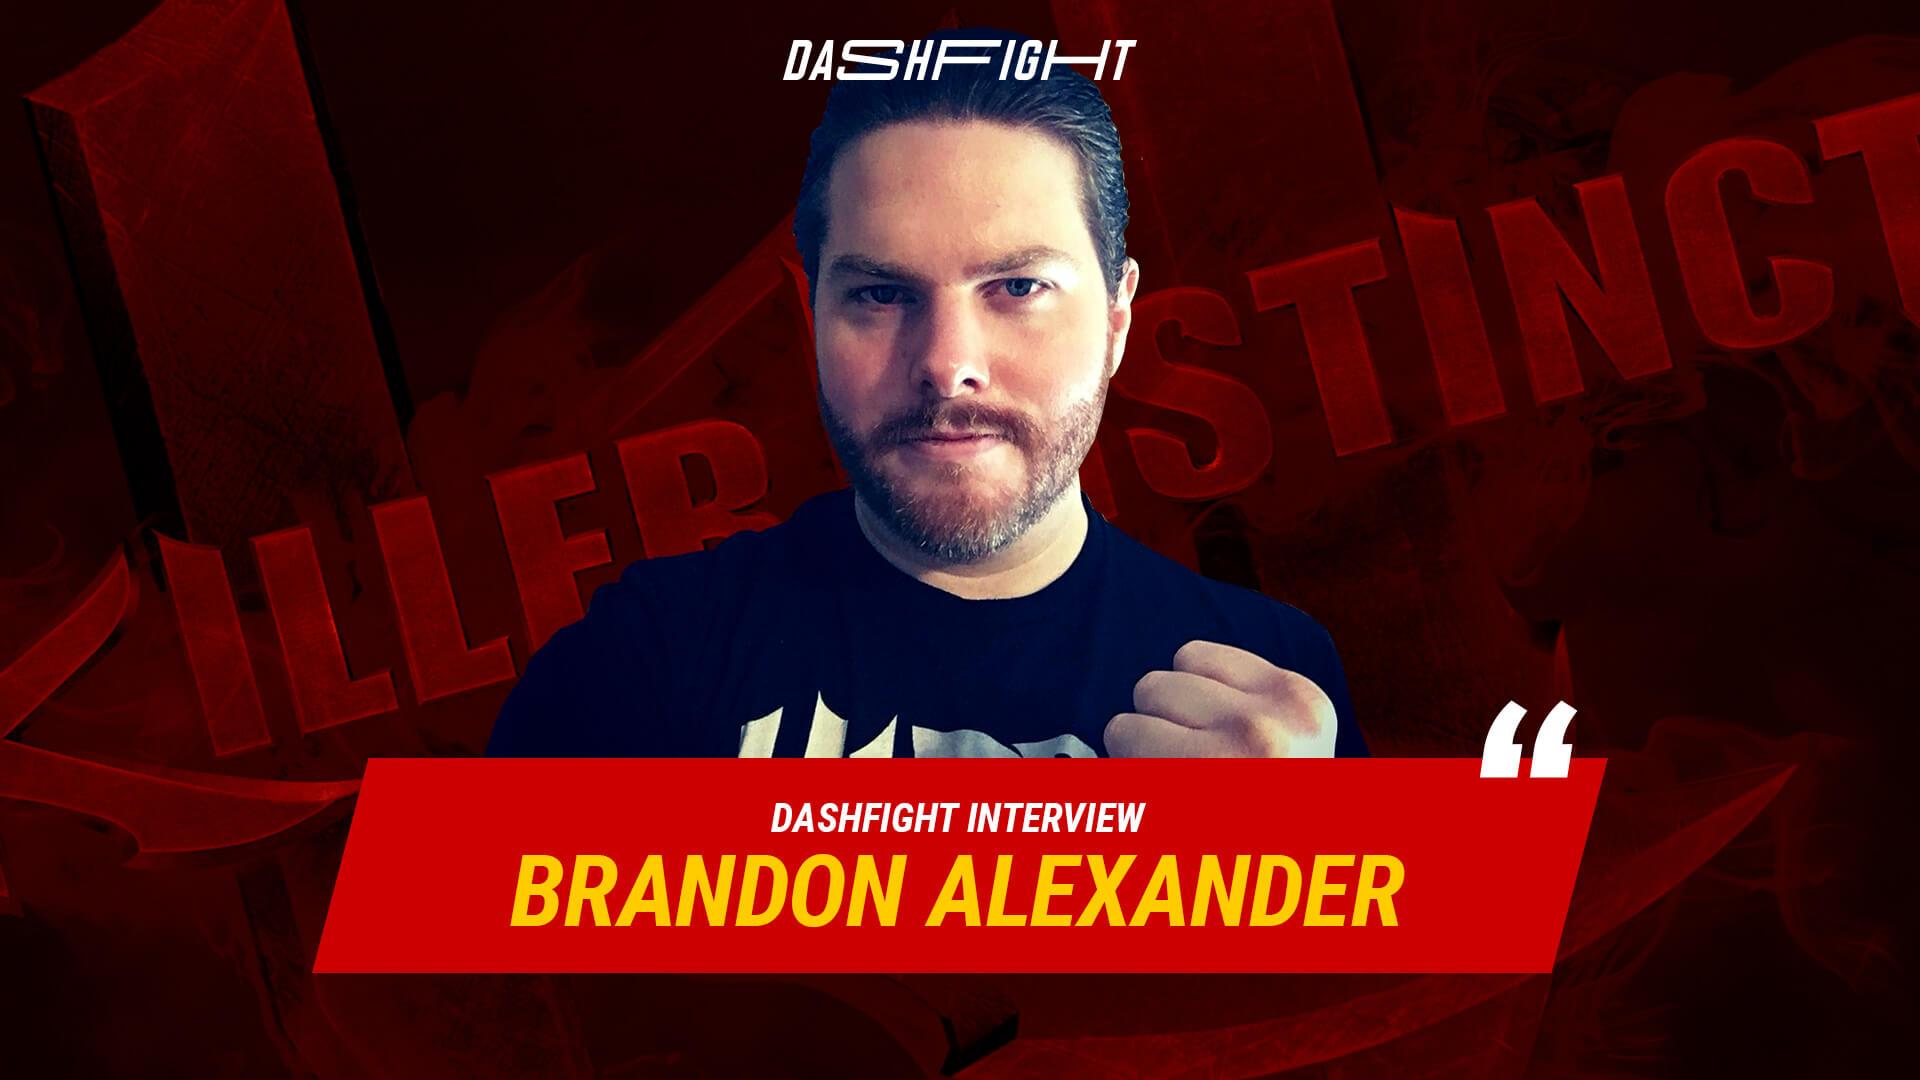 Interview with Brandon Alexander